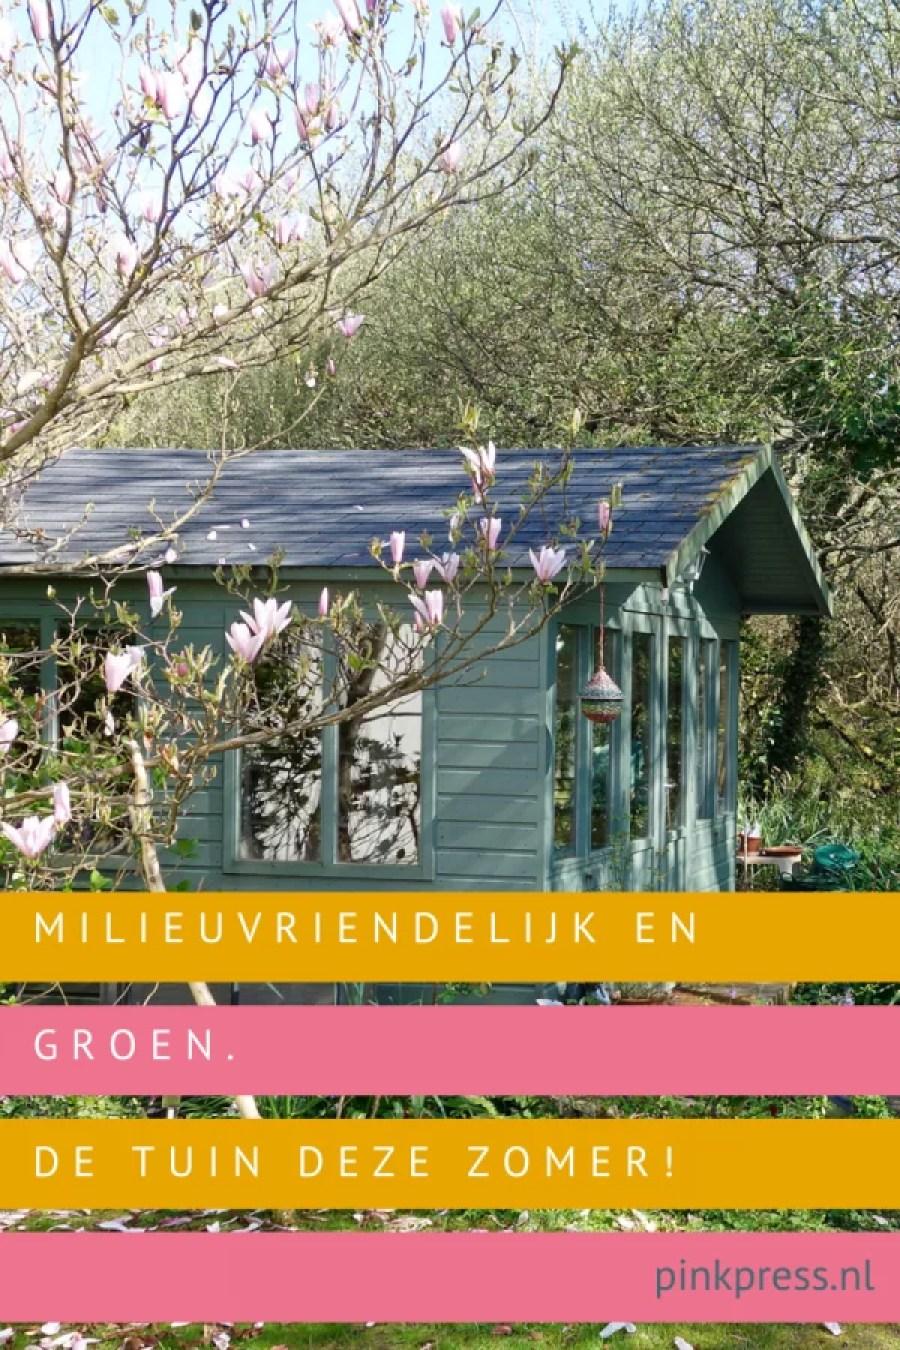 26FB76D4 045A 4108 9C87 F7FD608384DD - Een landelijke groene tuin doe je zo!